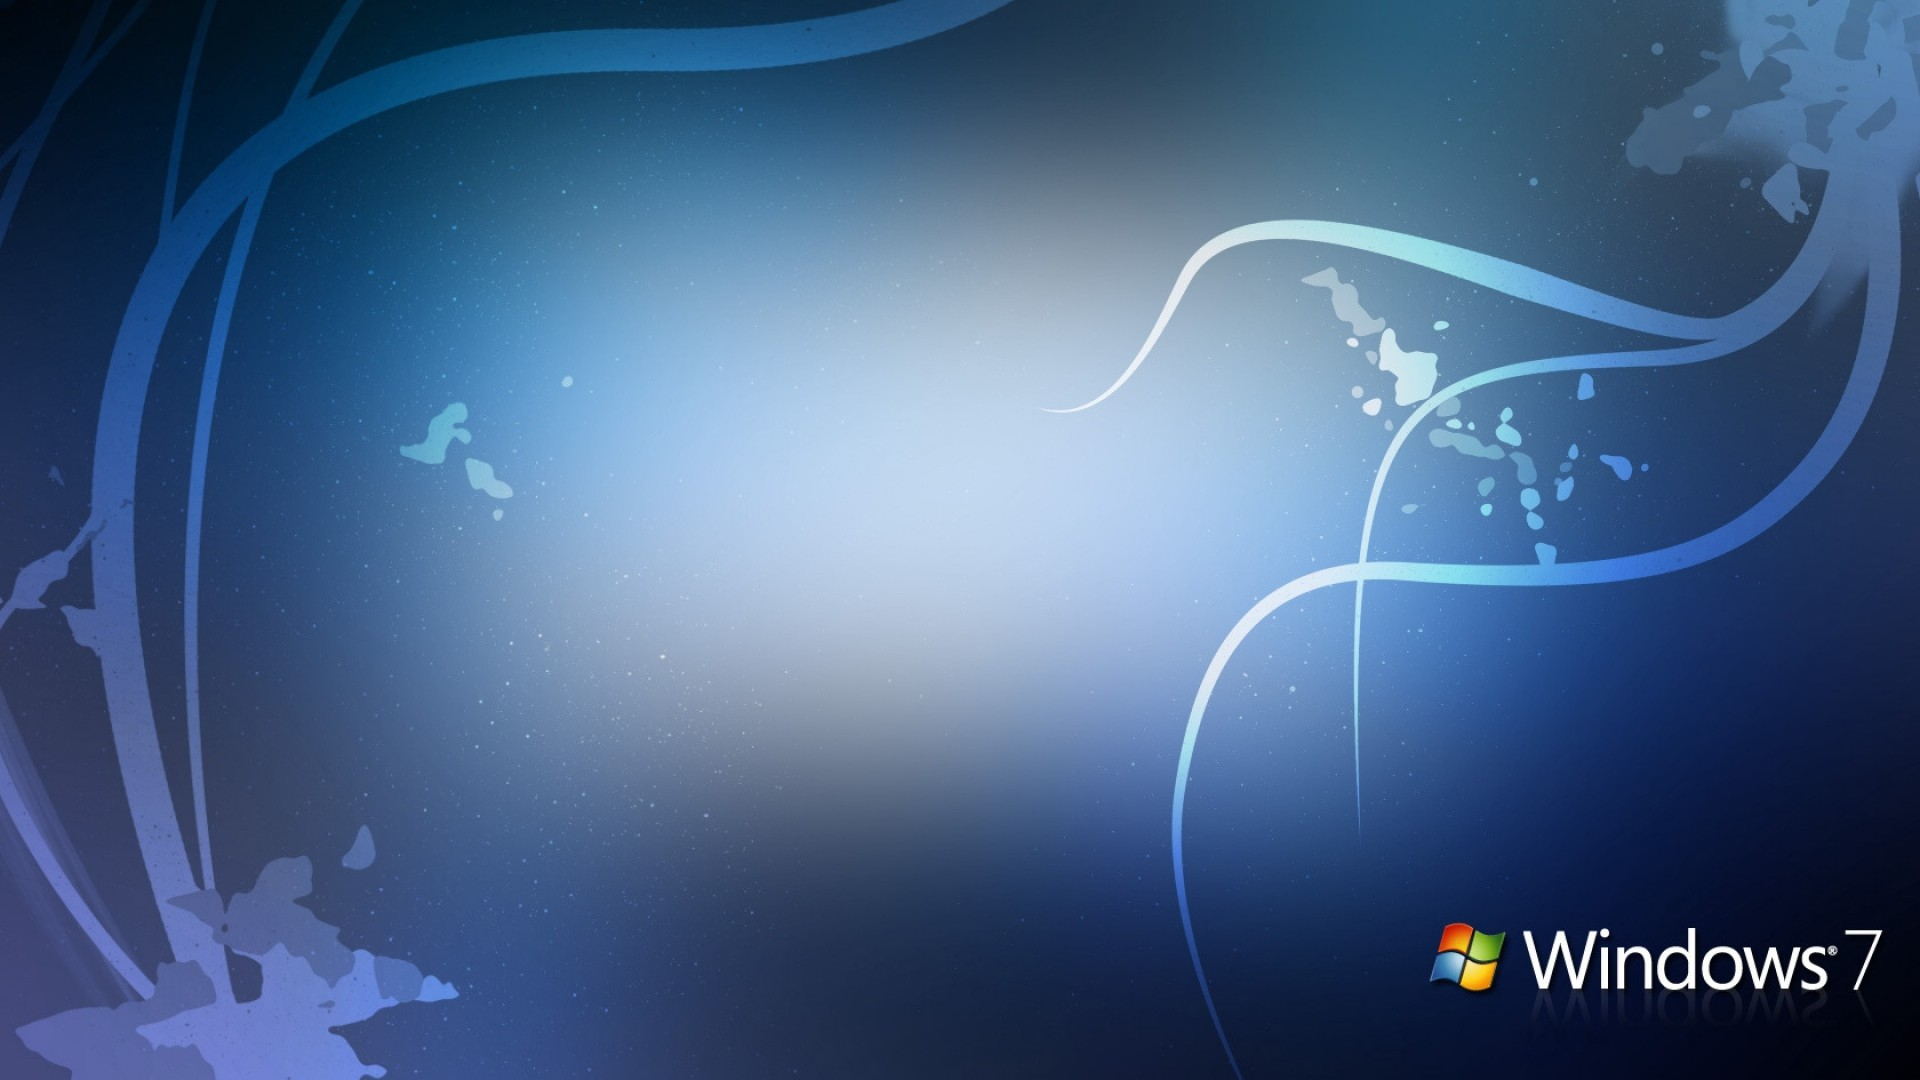 Full HD p Windows Wallpapers HD, Desktop Backgrounds HD Windows 7 Wallpapers  Wallpapers)